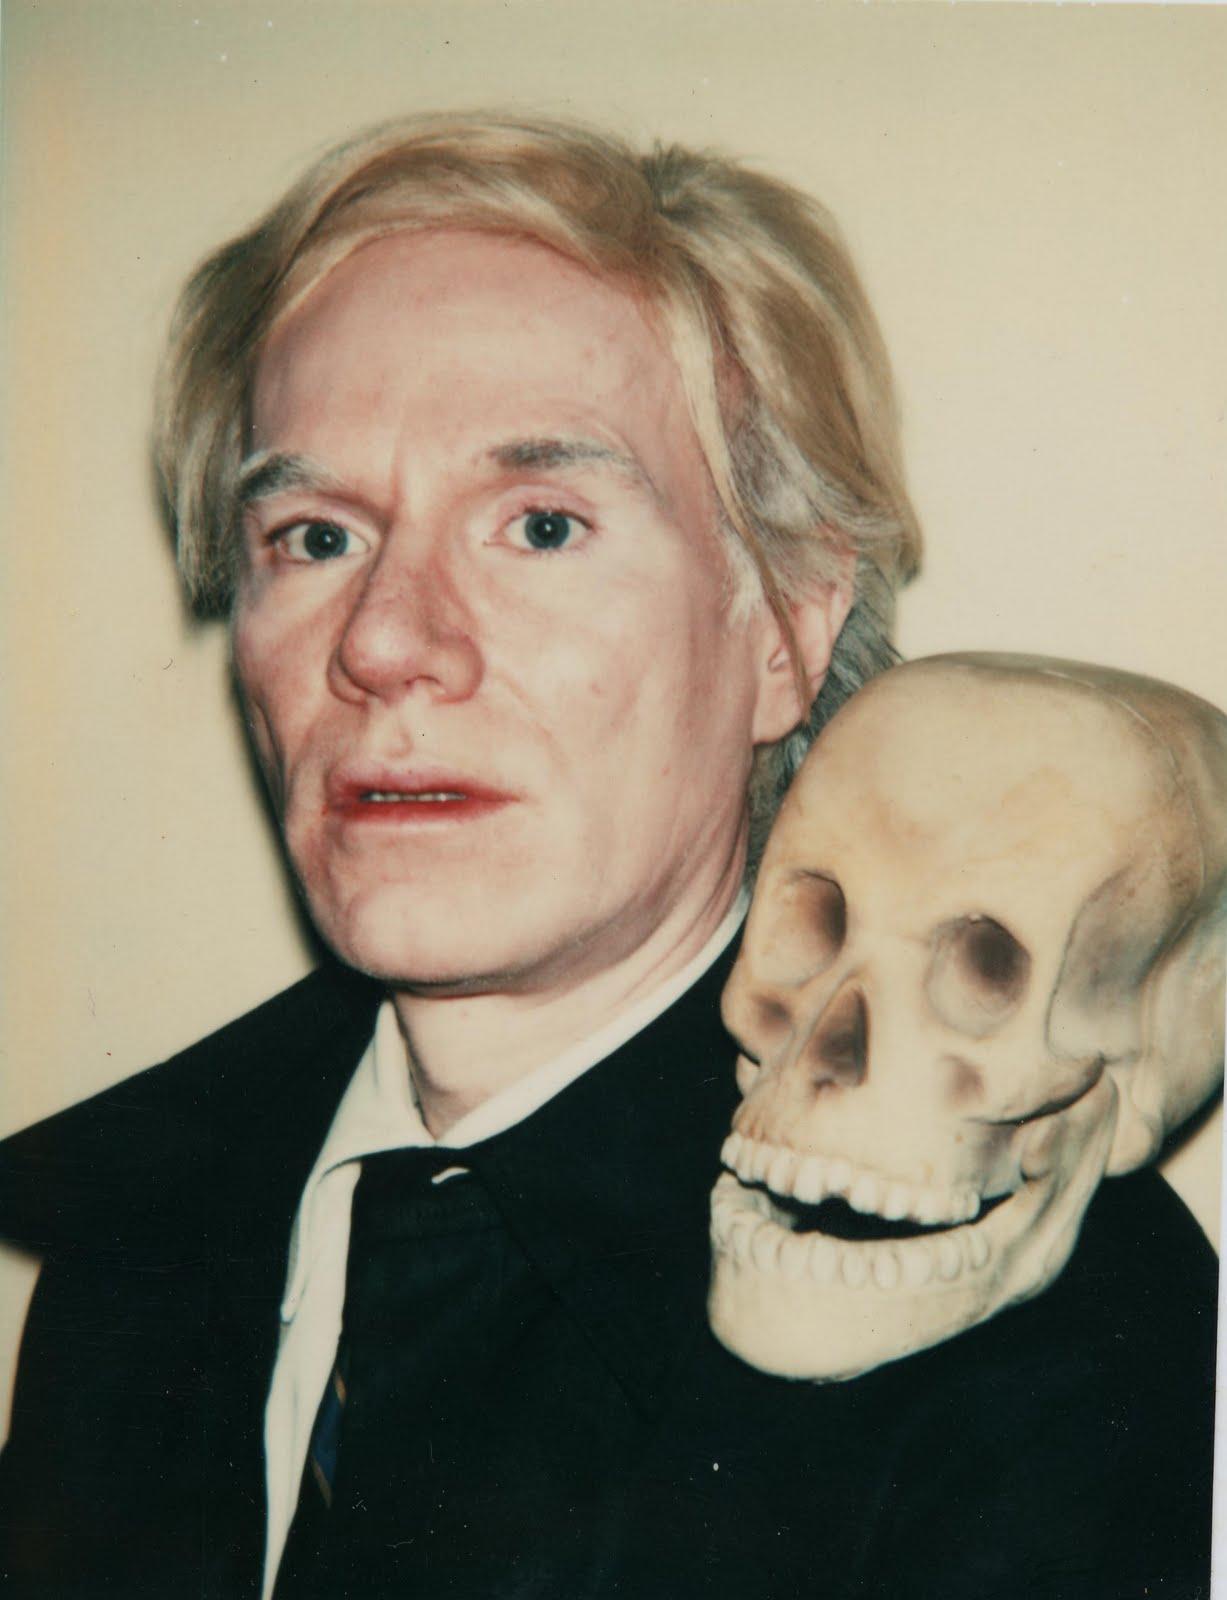 Molo's Sketc... Andy Warhol Self Portrait With Skull